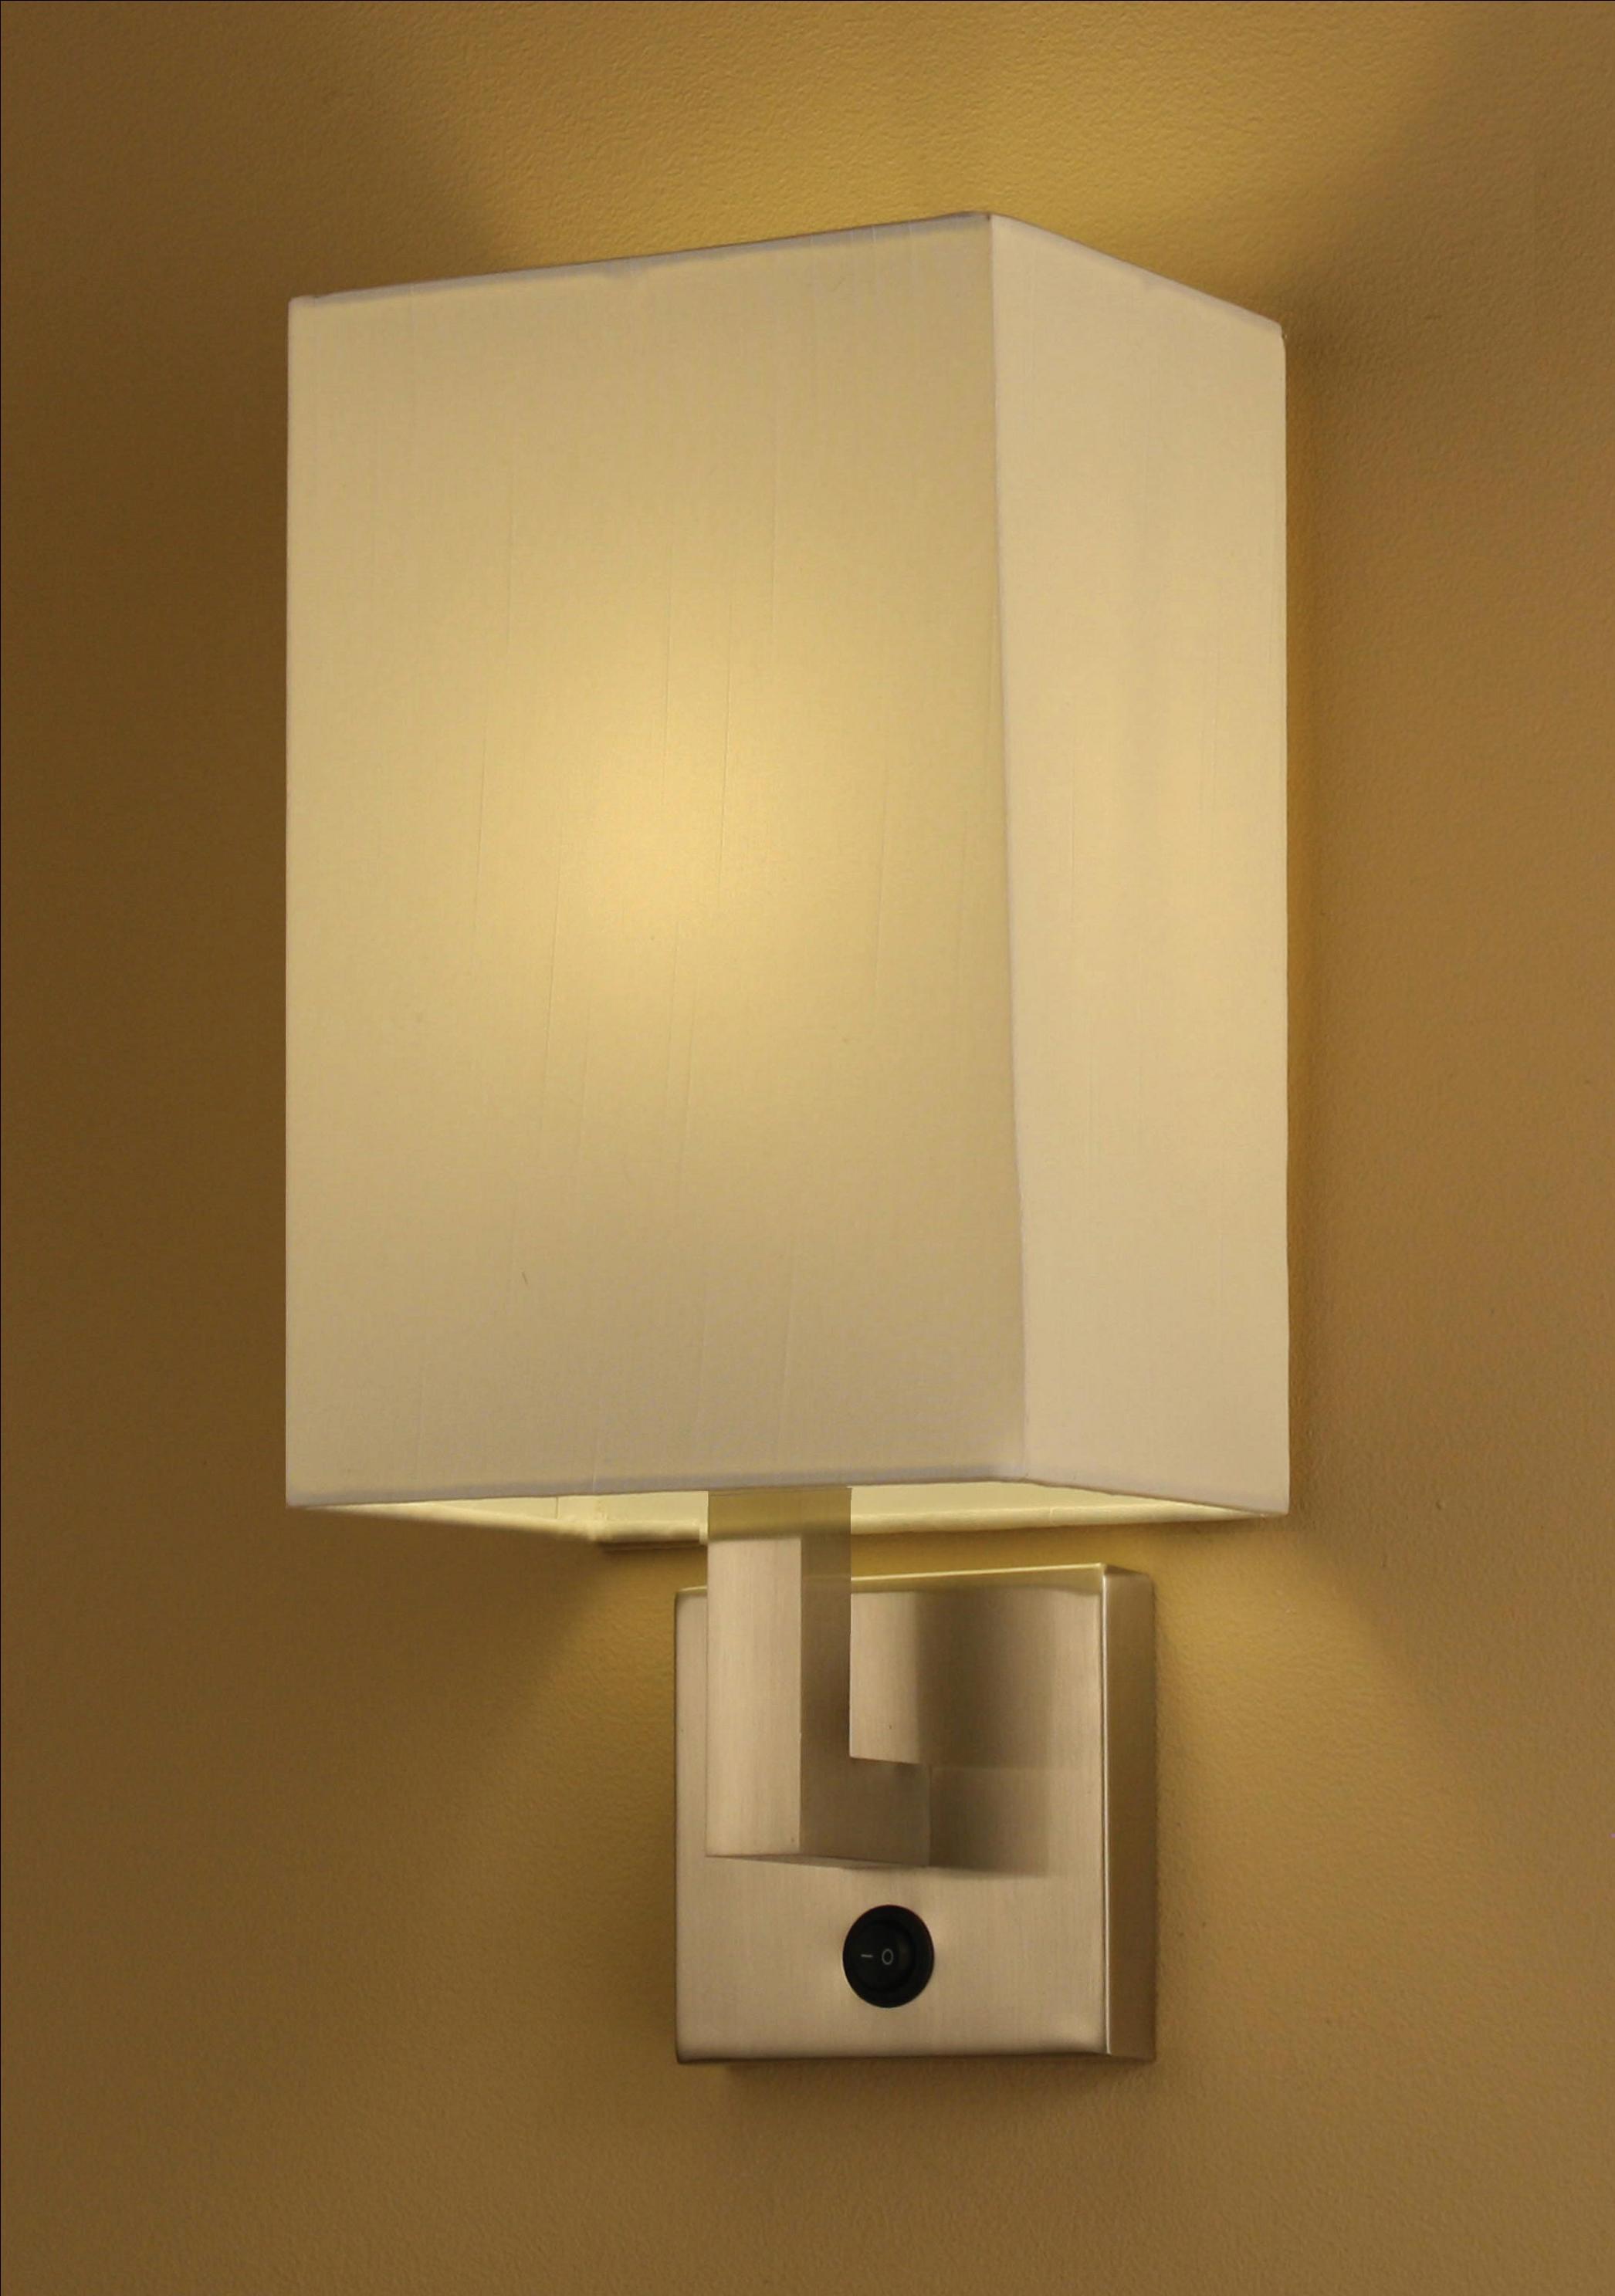 nightstand lighting. led light headboard nightstand sconce lighting l